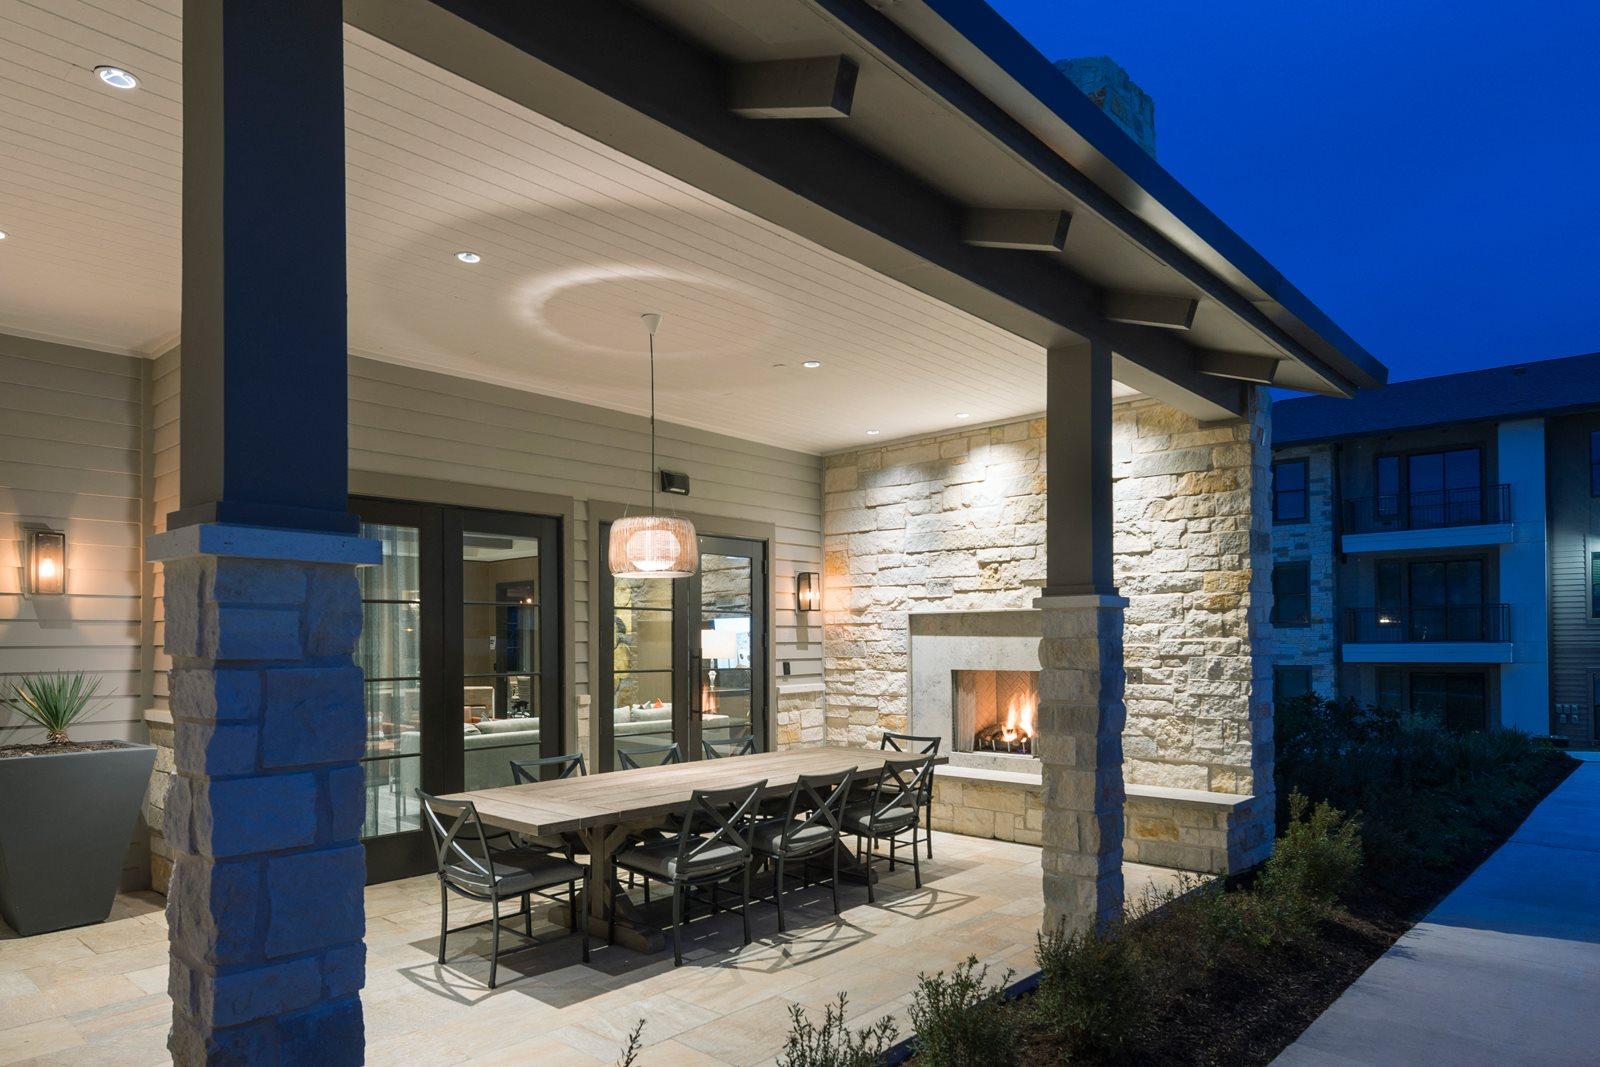 Open-Air Dining Porch with Fireplace at Windsor Lantana Hills, Austin, TX